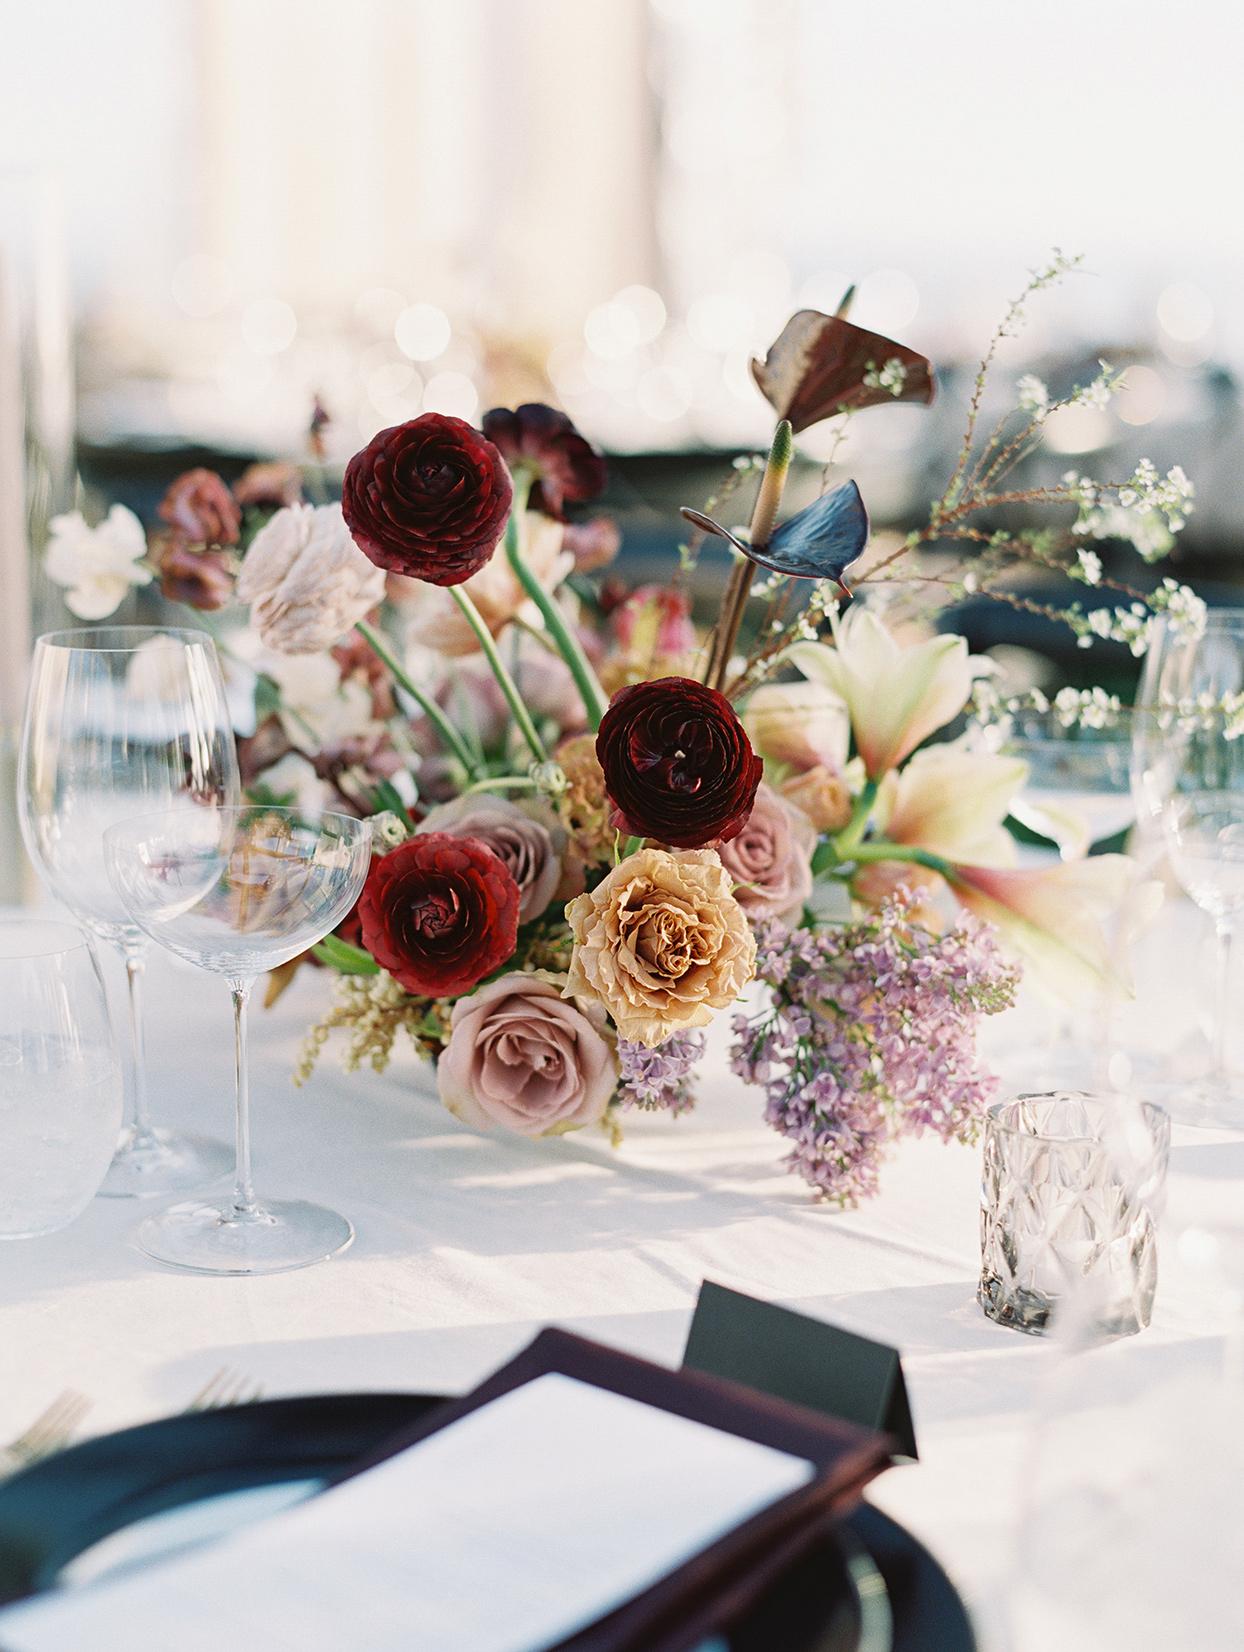 elegant warm tones floral centerpieces on white tables